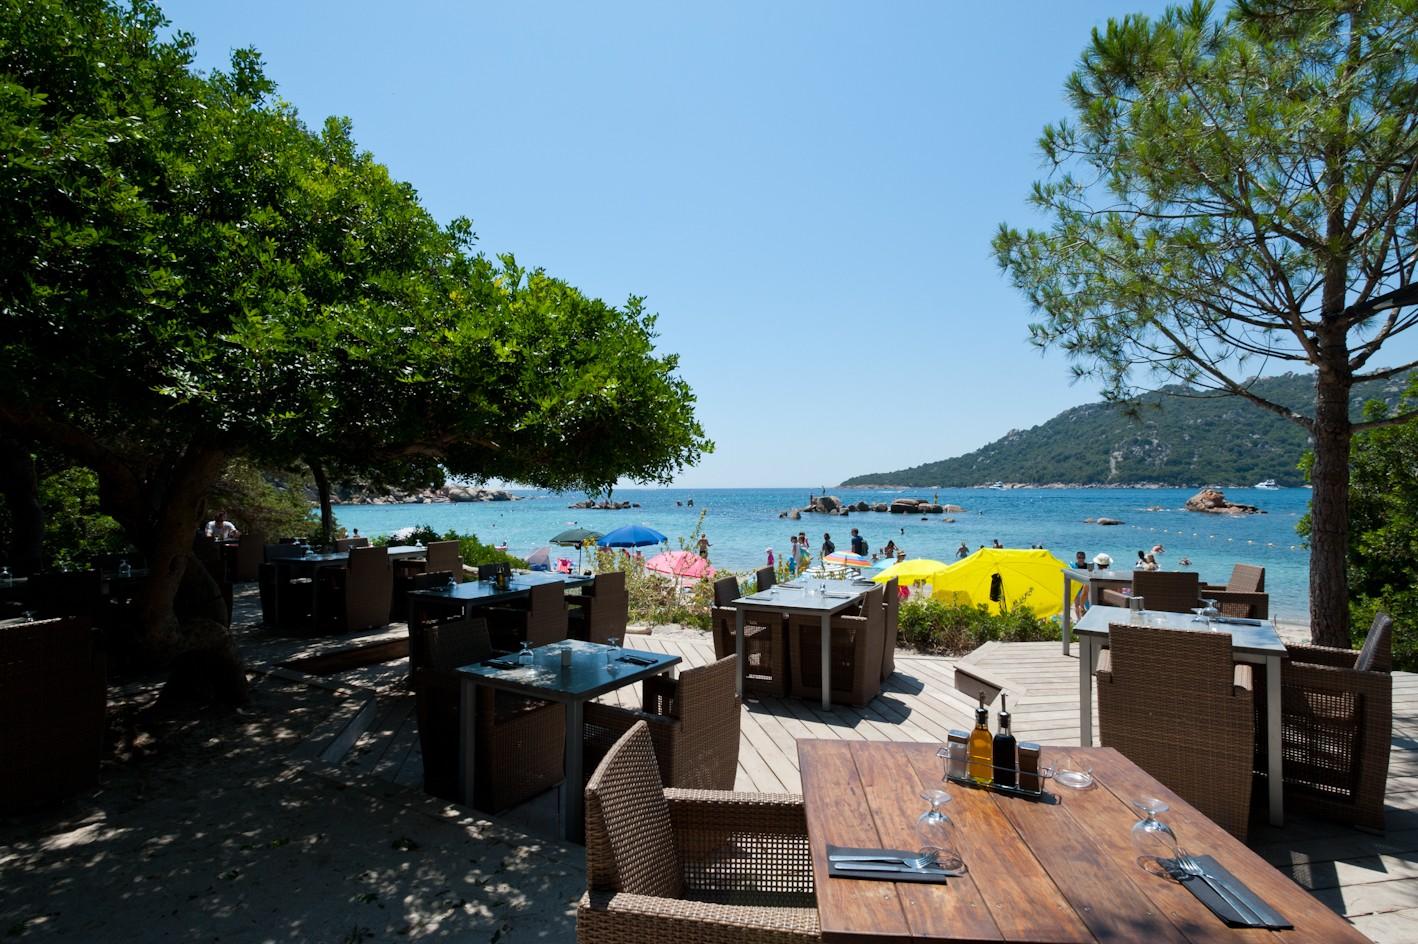 Restaurant Fort Santa-Giulia